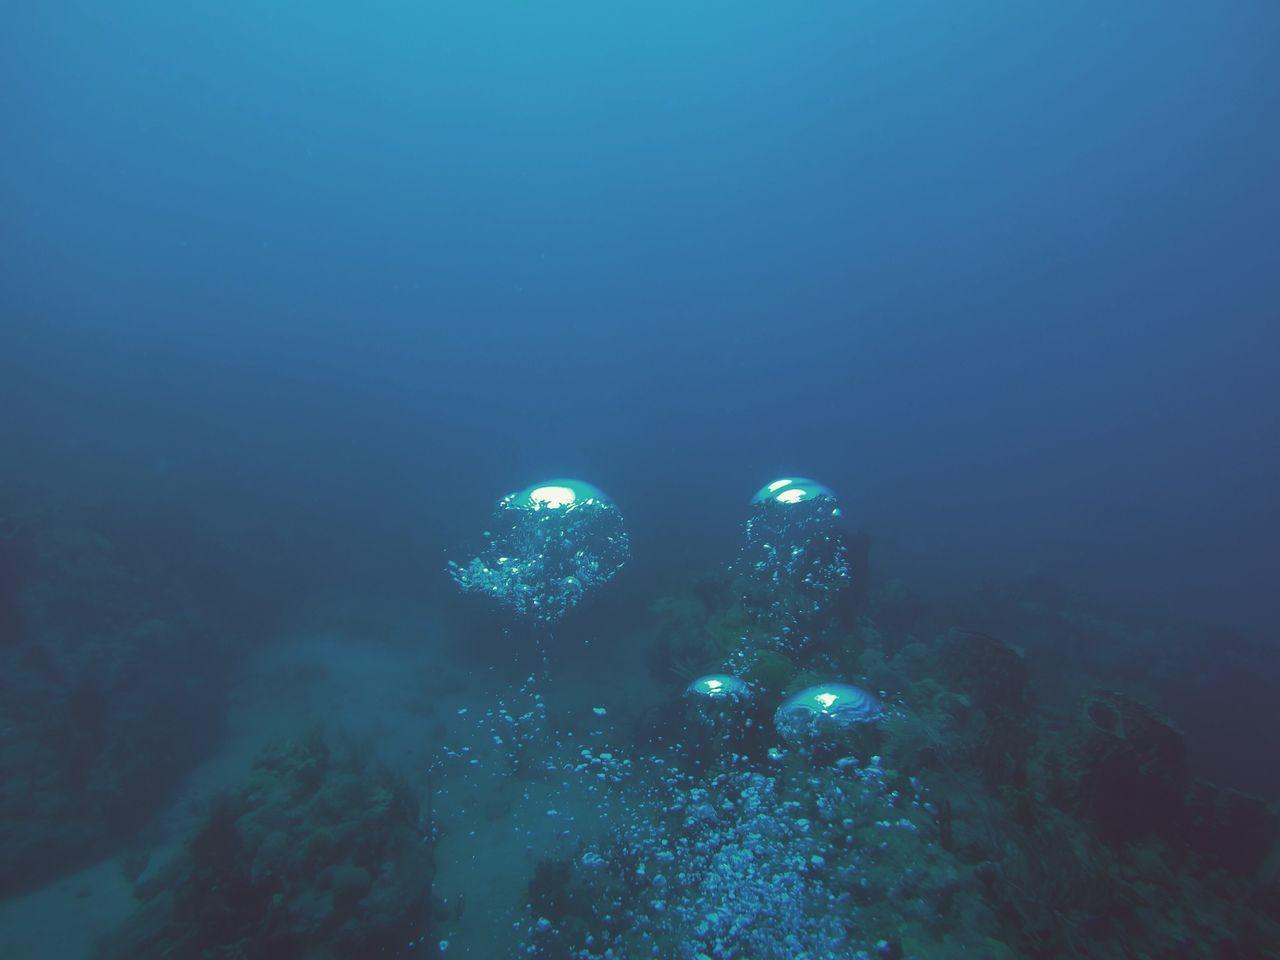 Scuba in Saba EyeEmNewHere Underwater UnderSea Scuba Diving Water Nature Exploration Blue Saba The Great Outdoors - 2017 EyeEm Awards